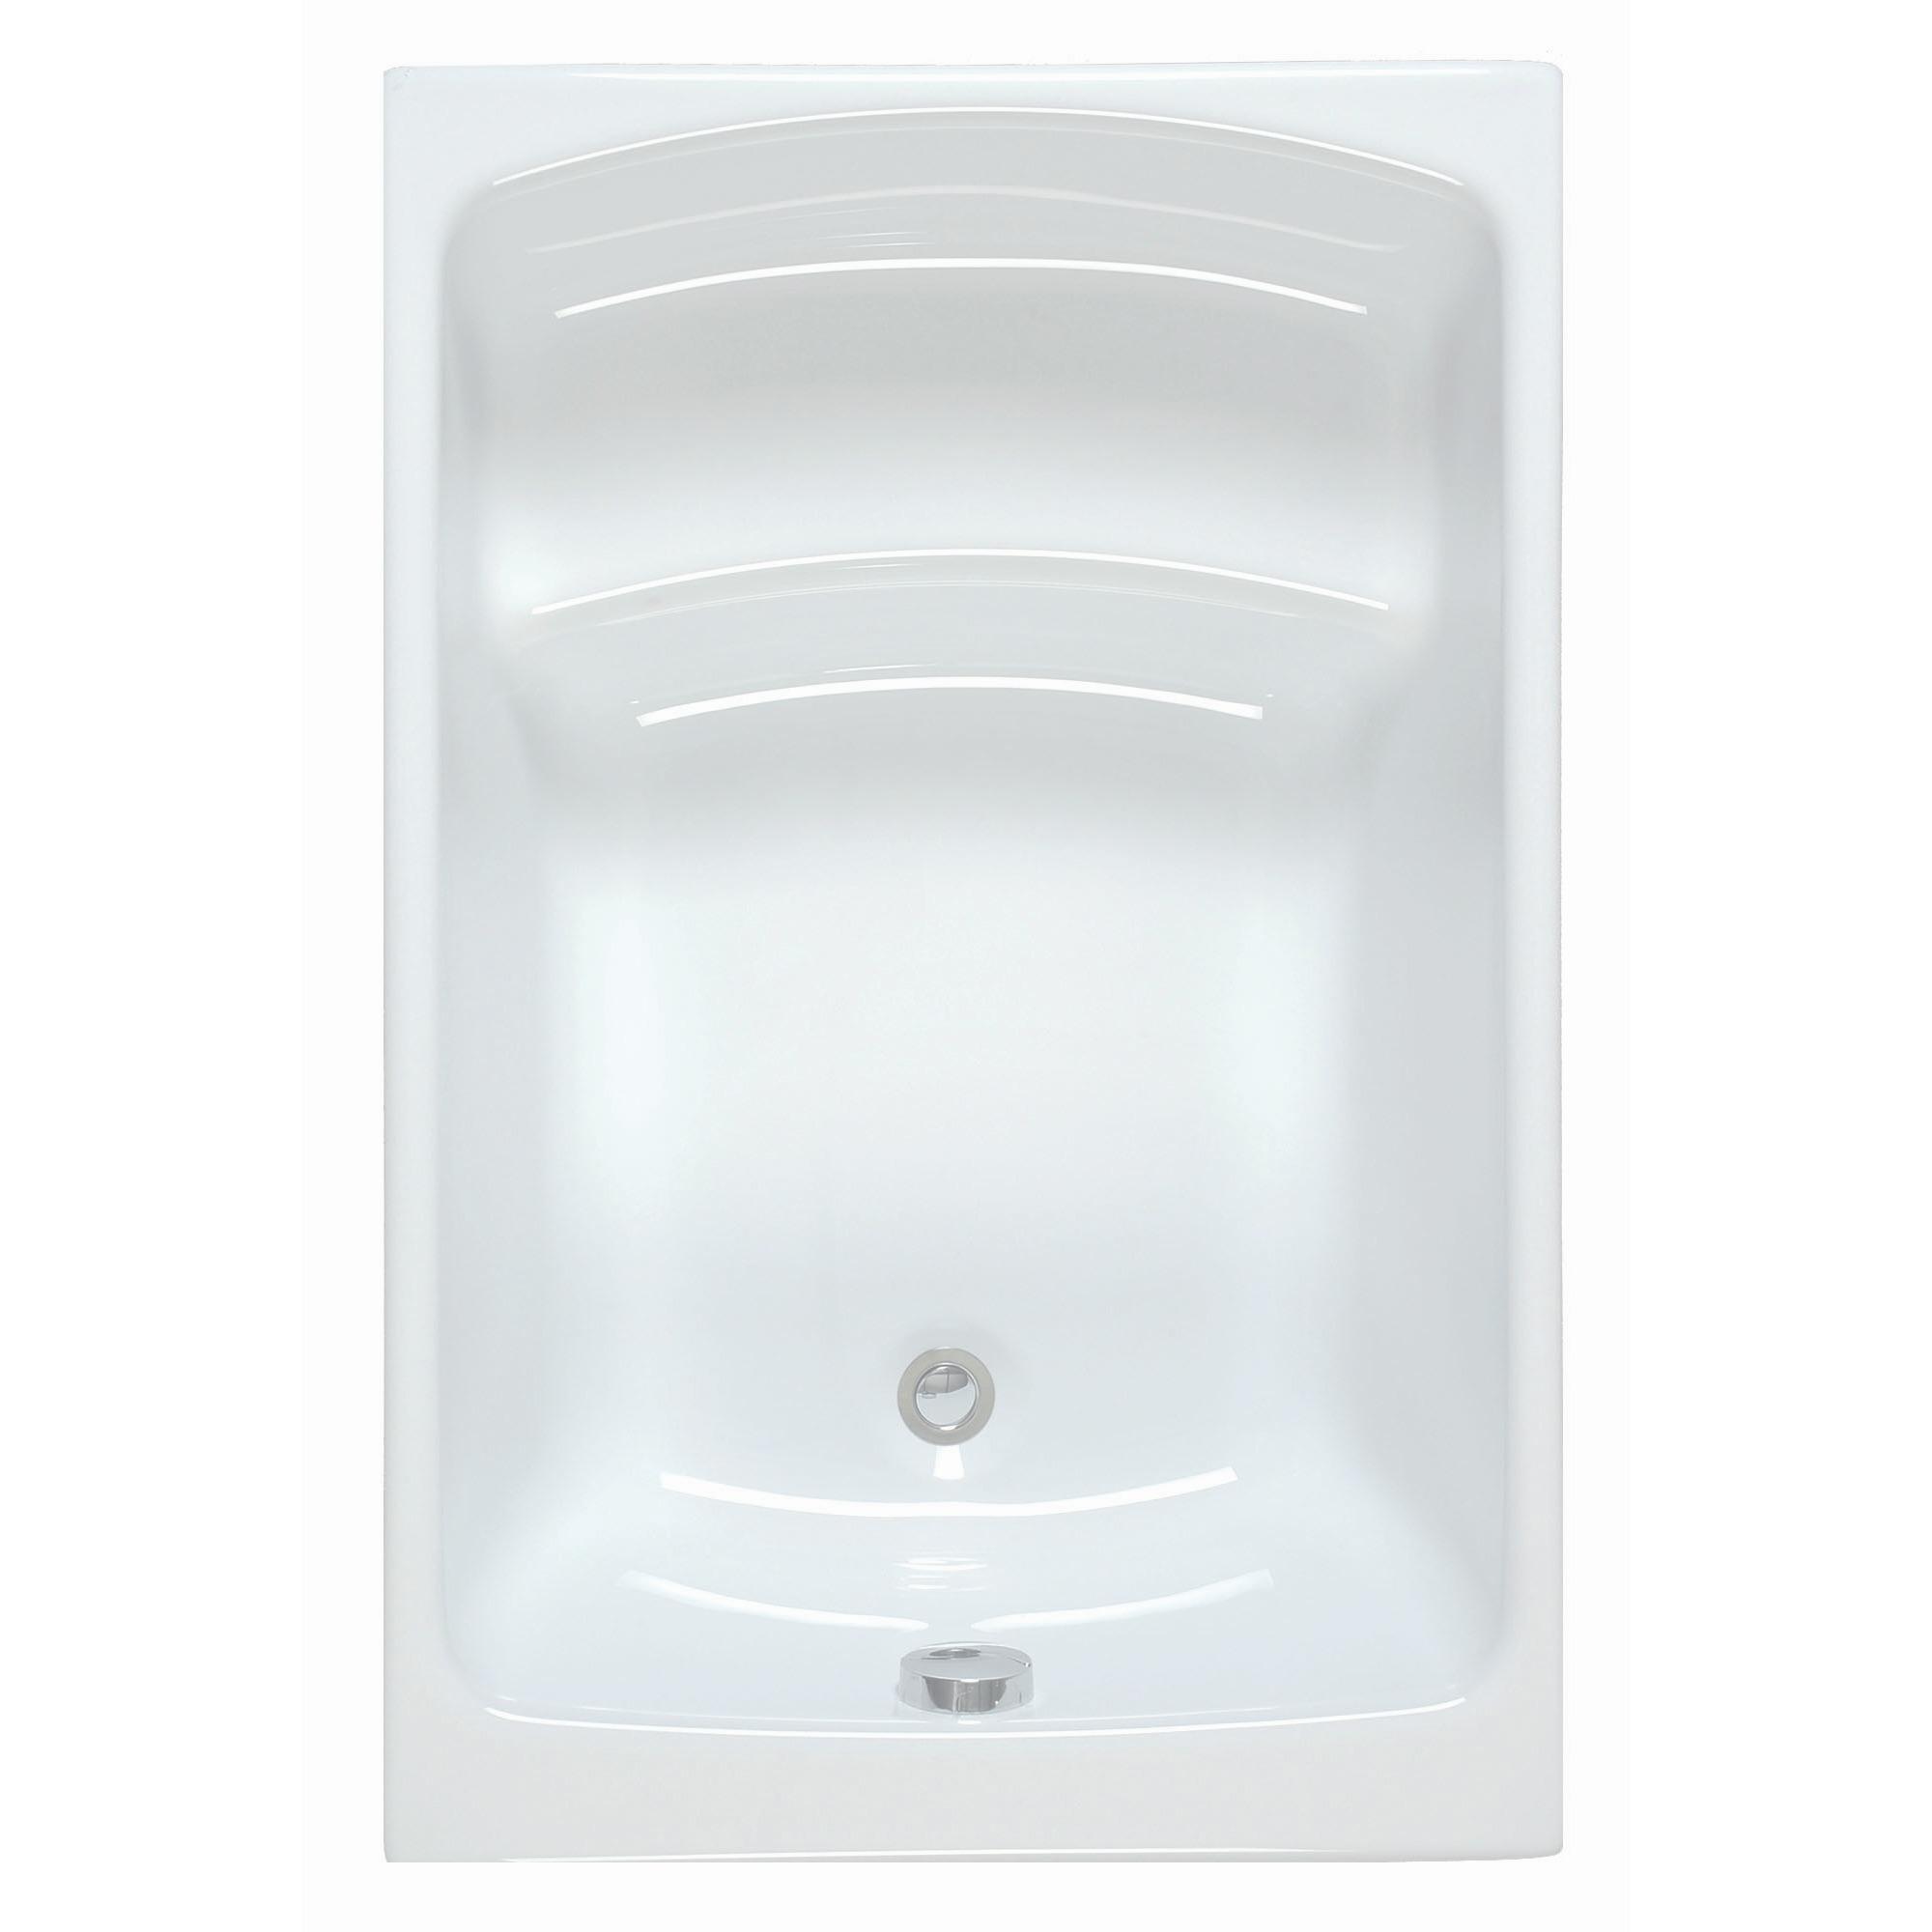 allibert baignoire sabot flavis ca 105x70 toplax blanc. Black Bedroom Furniture Sets. Home Design Ideas